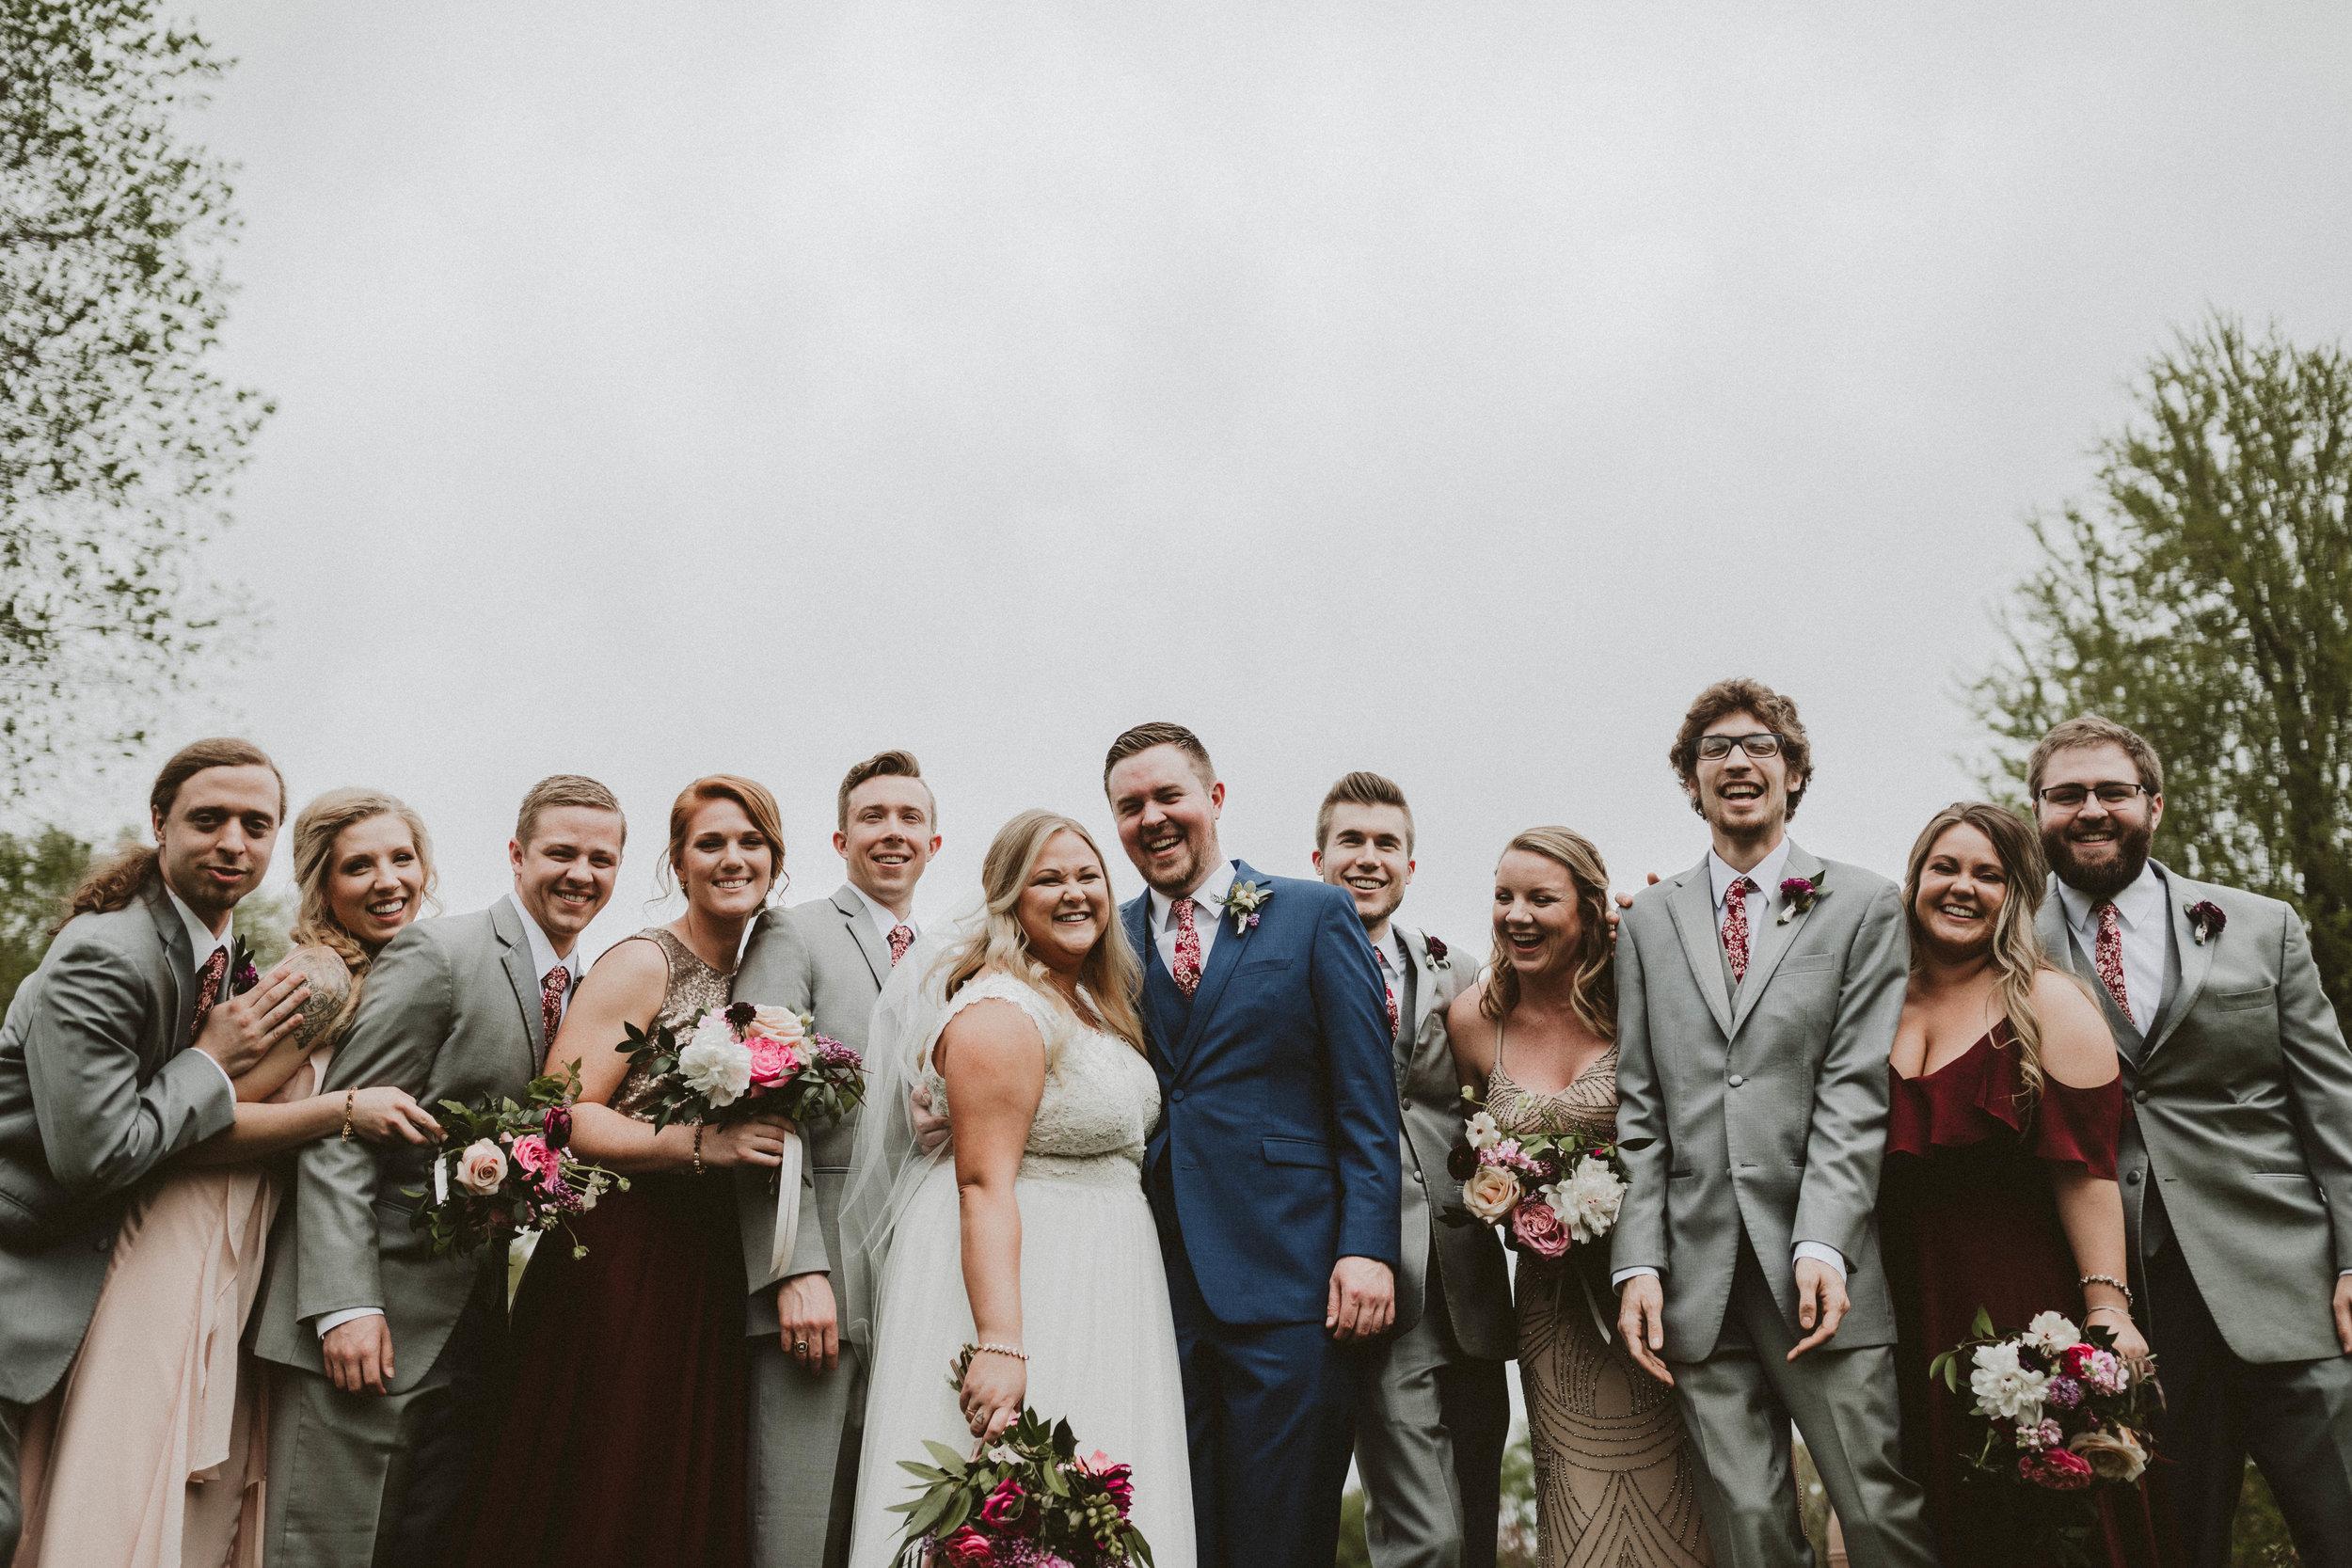 pittsburgh wedding photographer-332.jpg